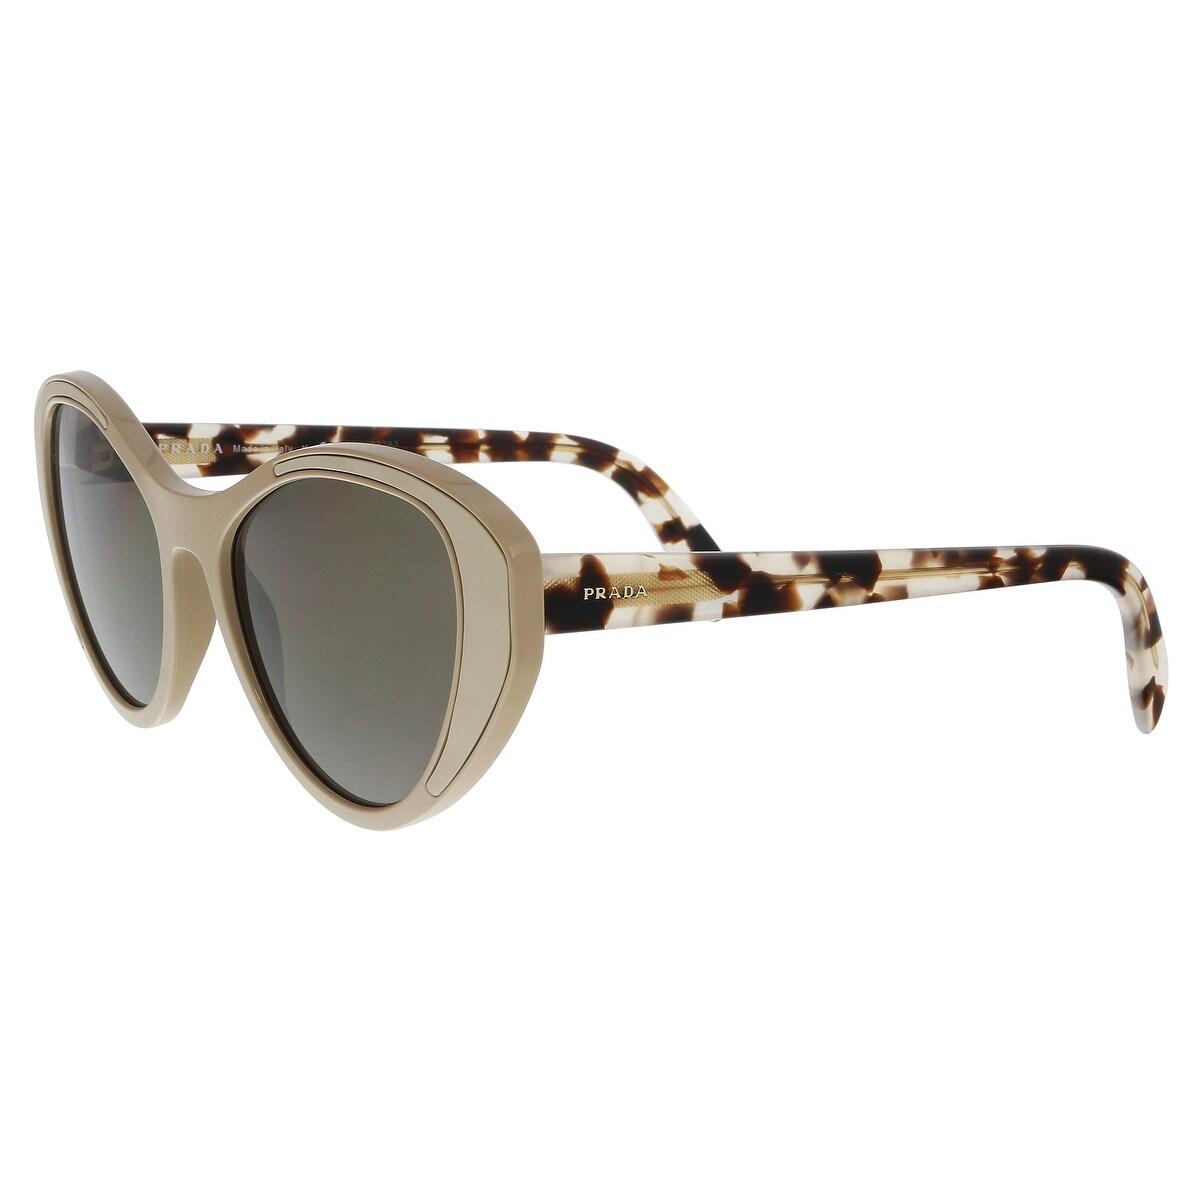 4fc3542984e98 Cateye Prada Women s Sunglasses